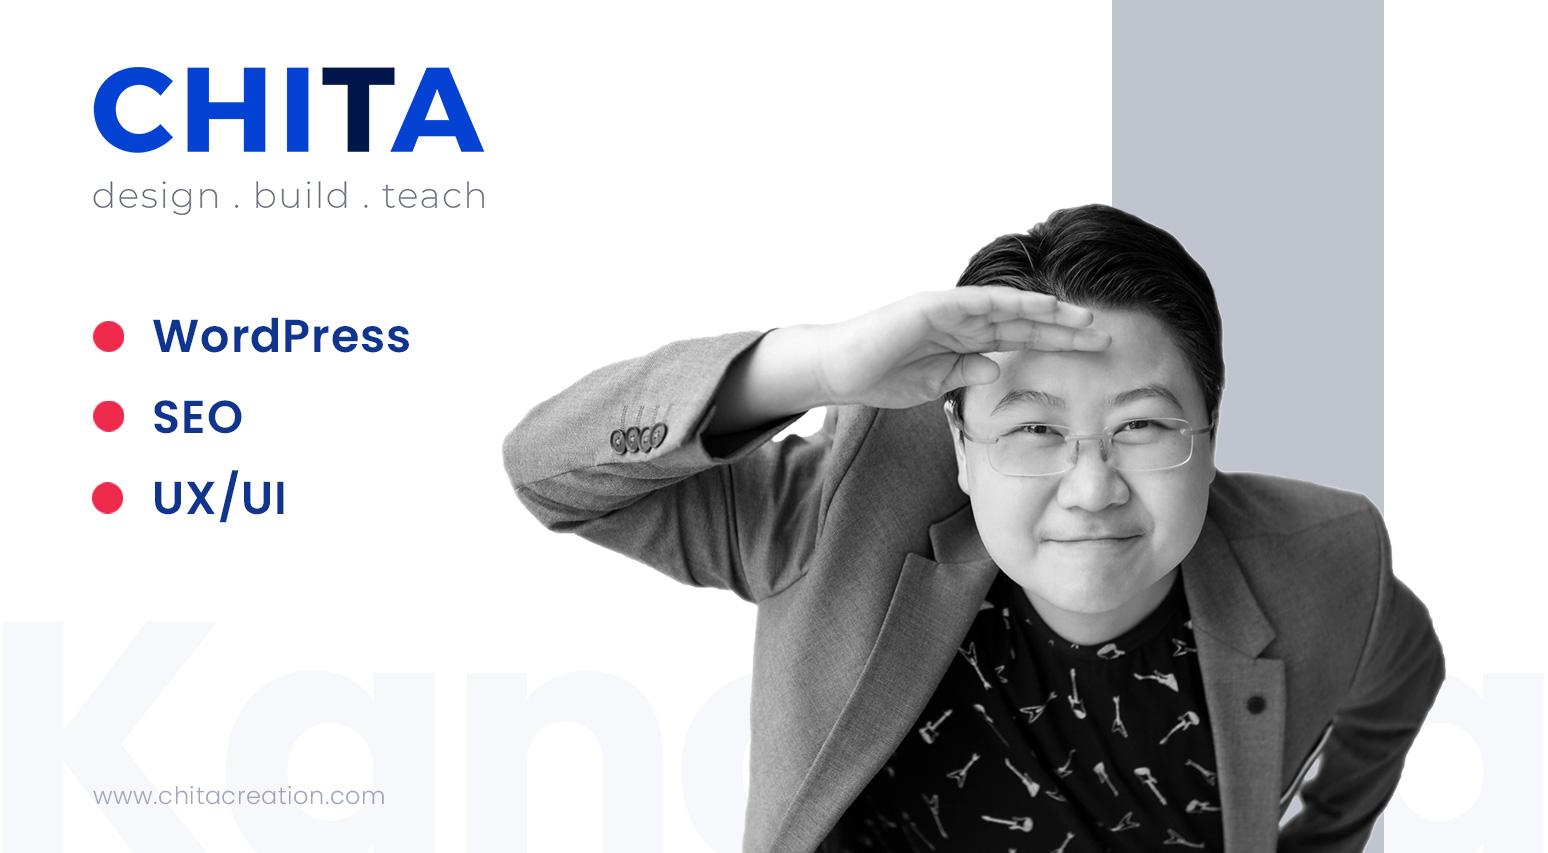 CHITA Creation - design build teach - Kanchita Varitthinanon